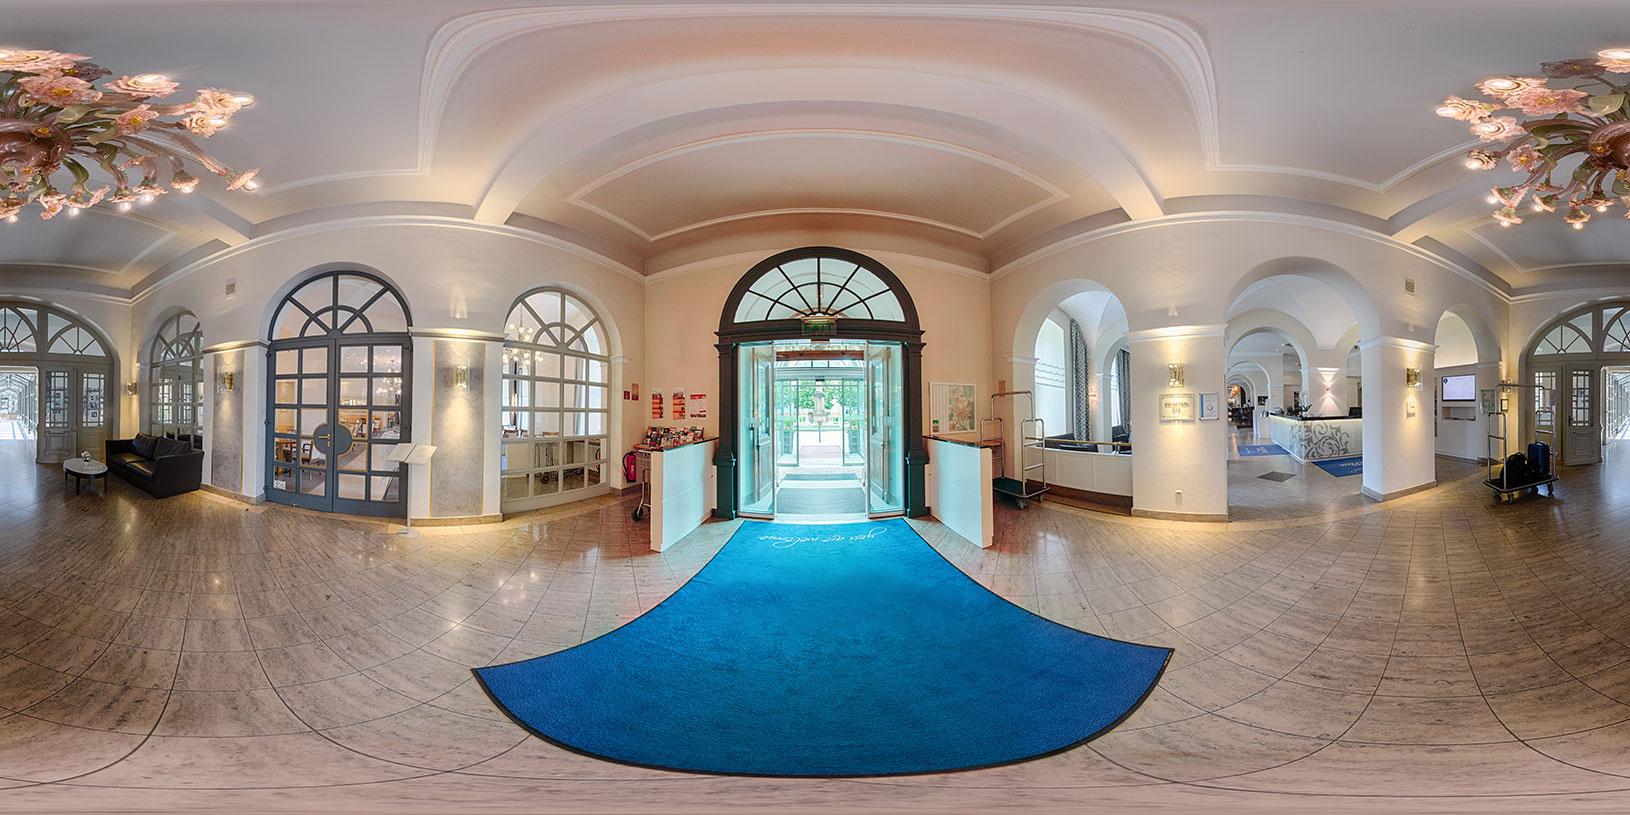 Hotel Residenz Bamberg Eingangsbereich